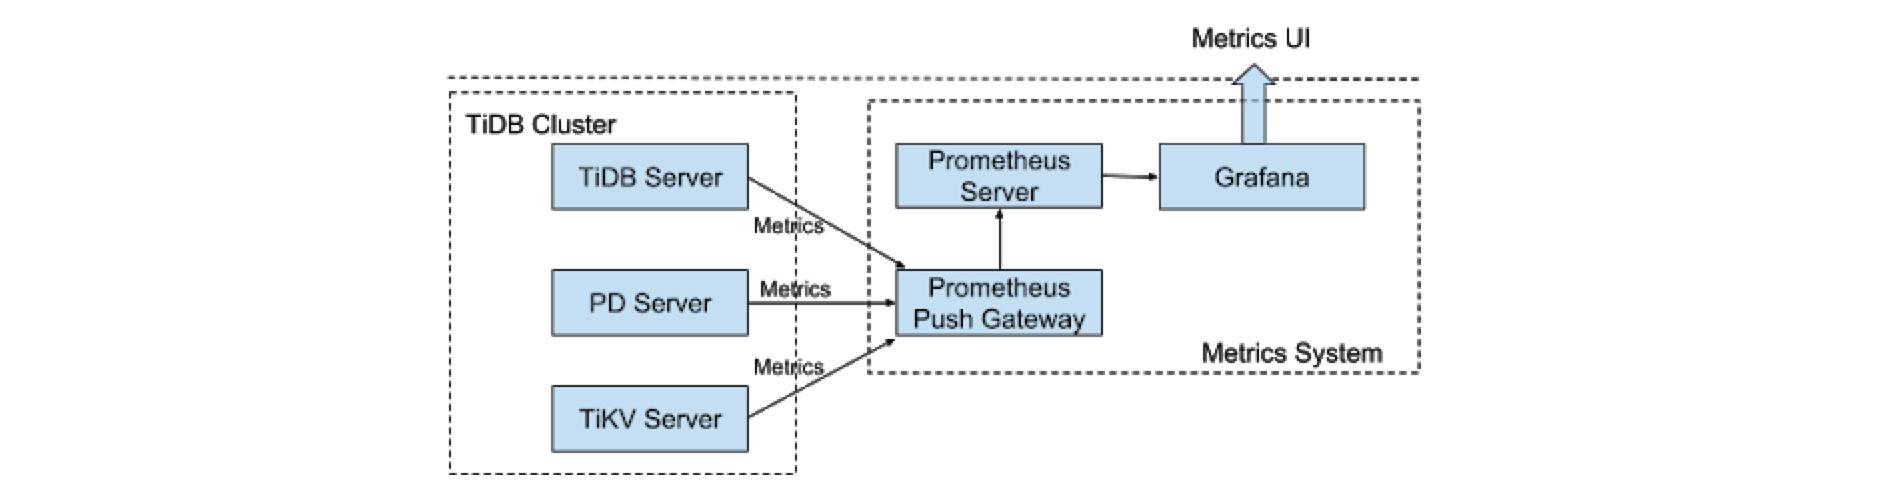 TiDB Monitoring Architecture